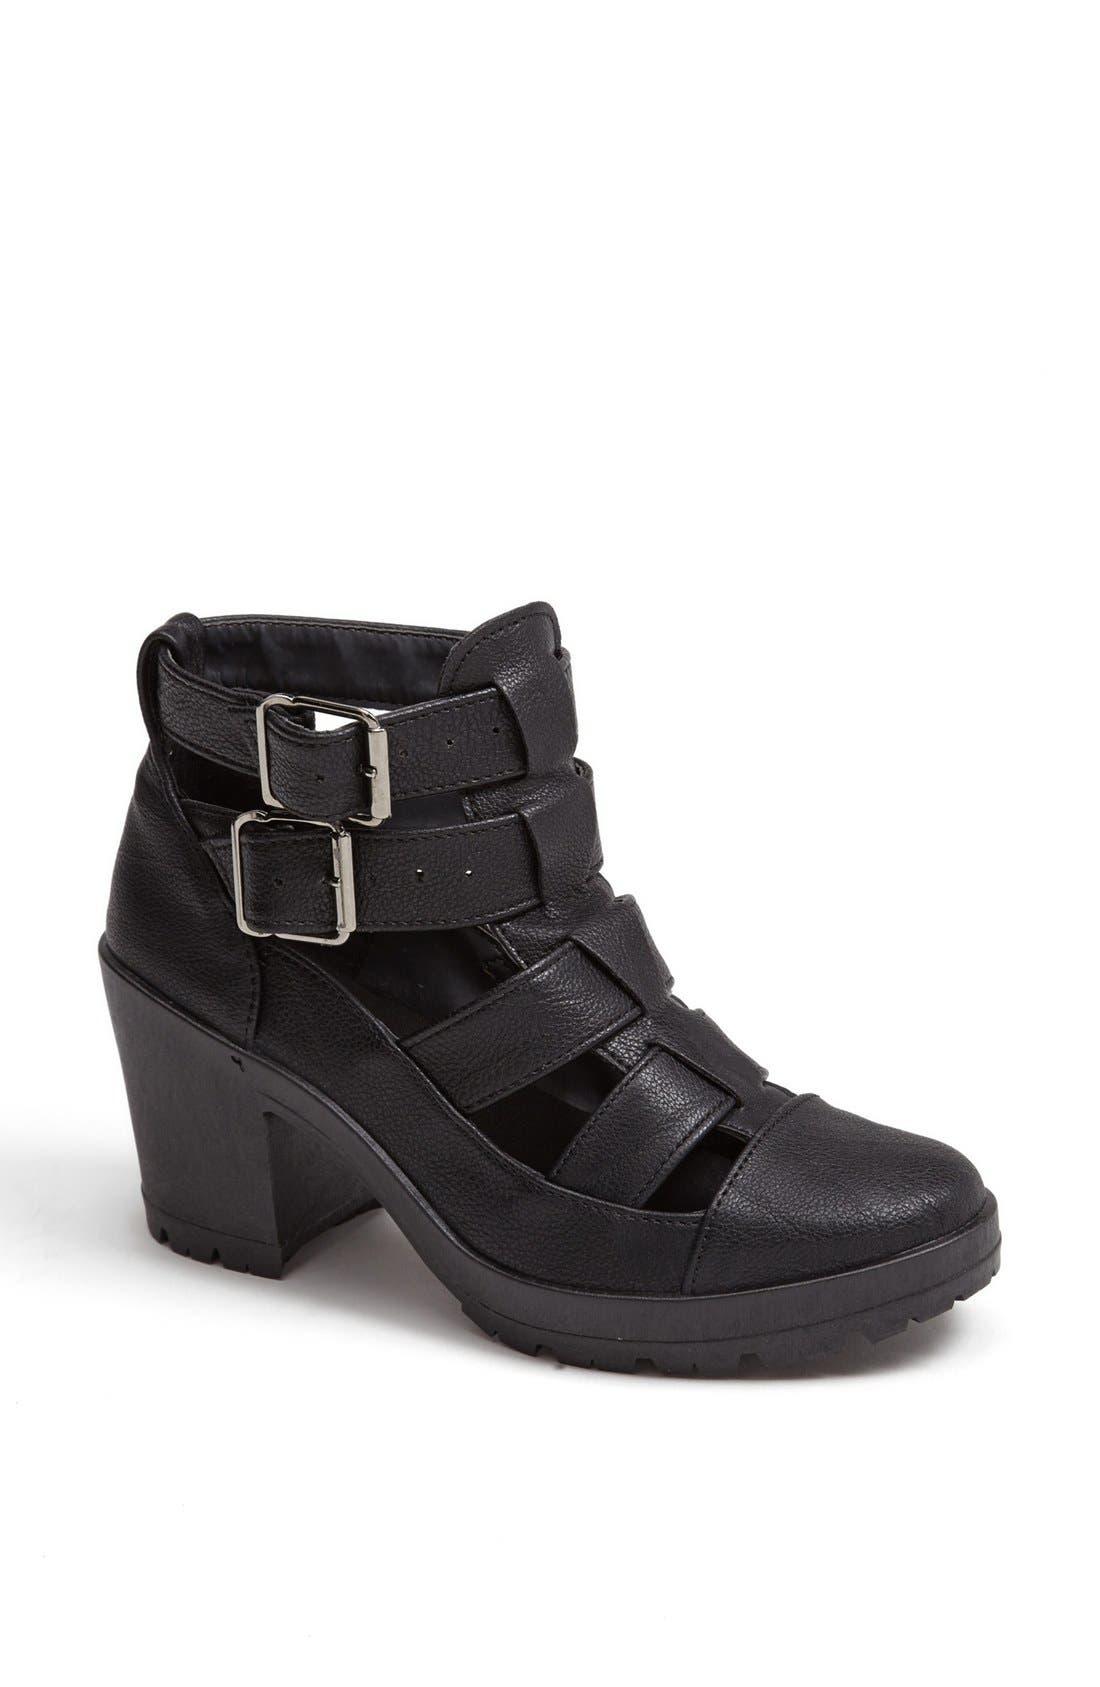 Main Image - Topshop 'Mega' Ankle Boot